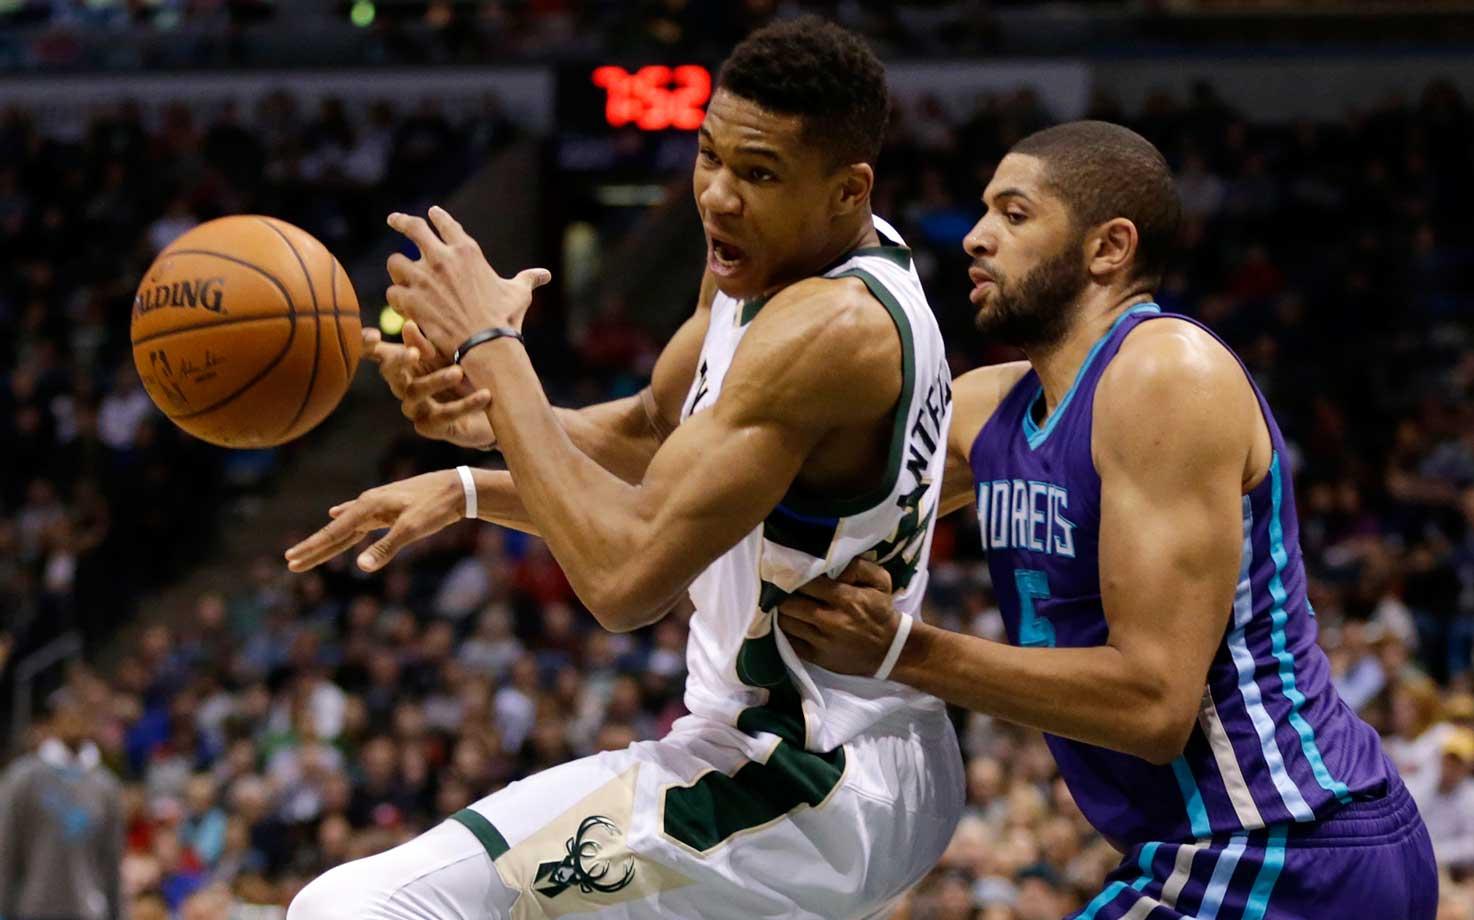 Nicolas Batum of the Charlotte Hornets picks the basketball from Giannis Antetokounmpo of the Milwaukee Bucks.